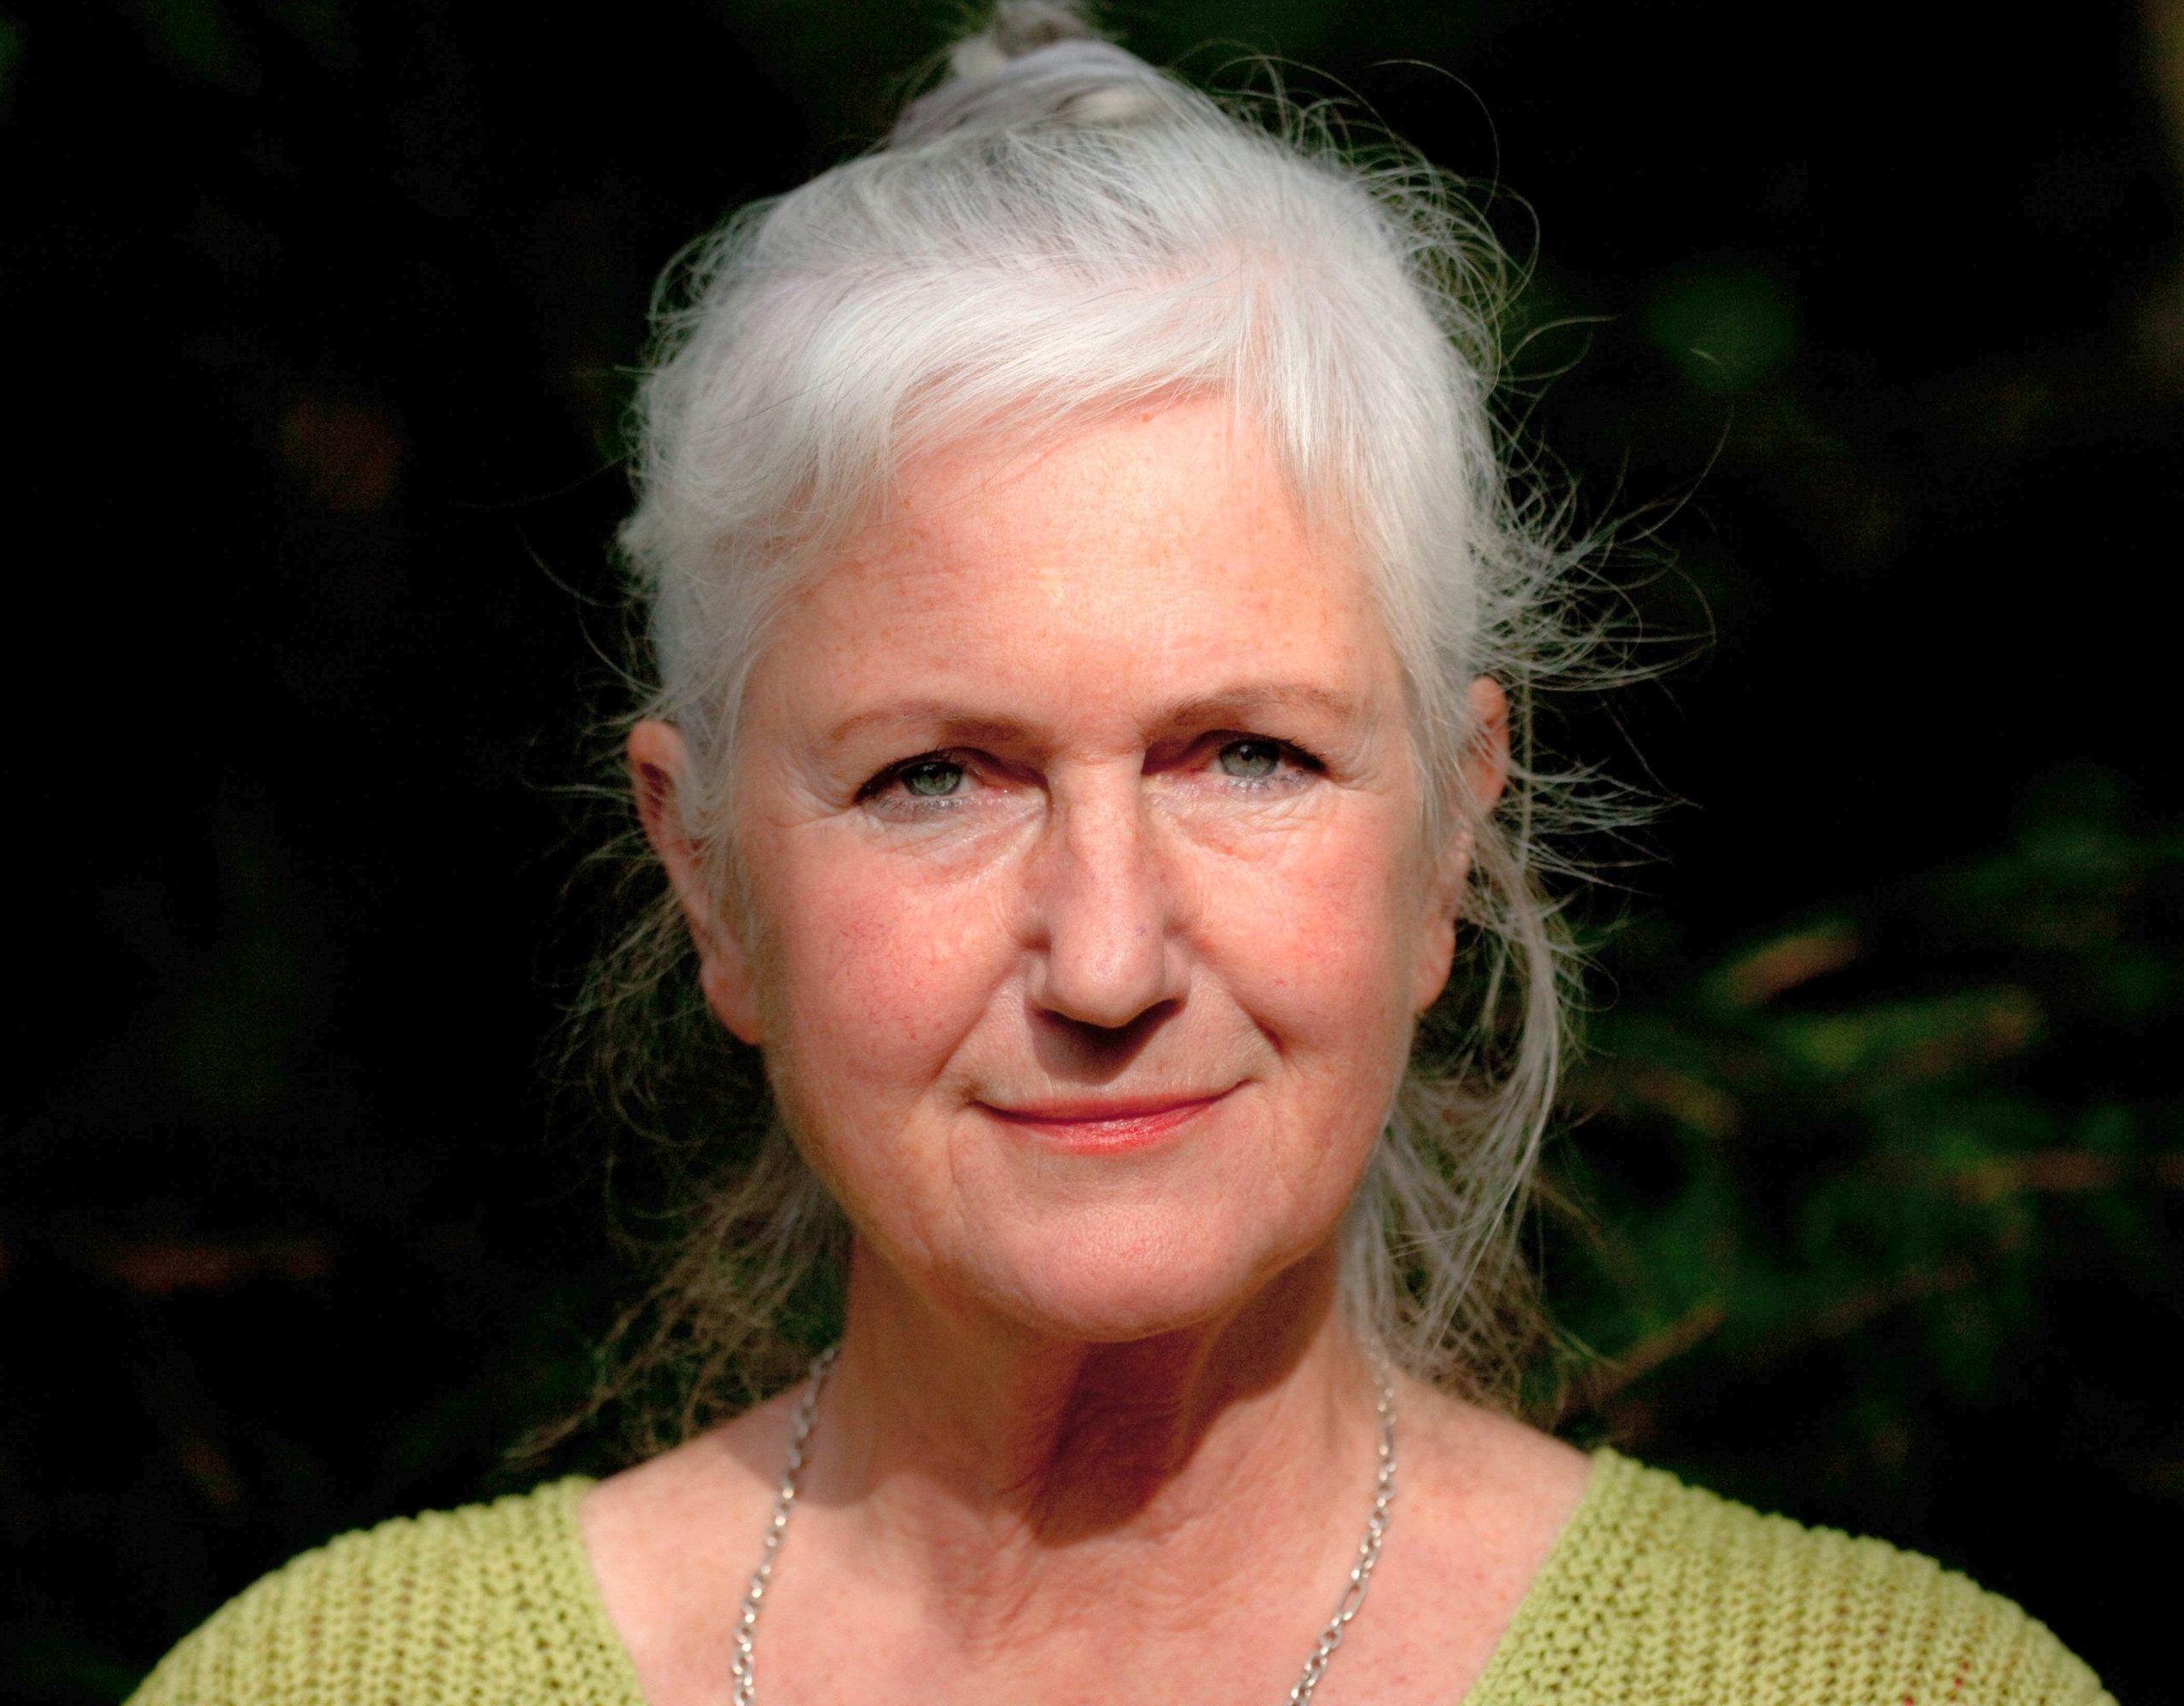 Portrait Angelika Thaysen | Supervision, Coaching & Beratung | Felde bei Kiel, Schleswig-Holstein